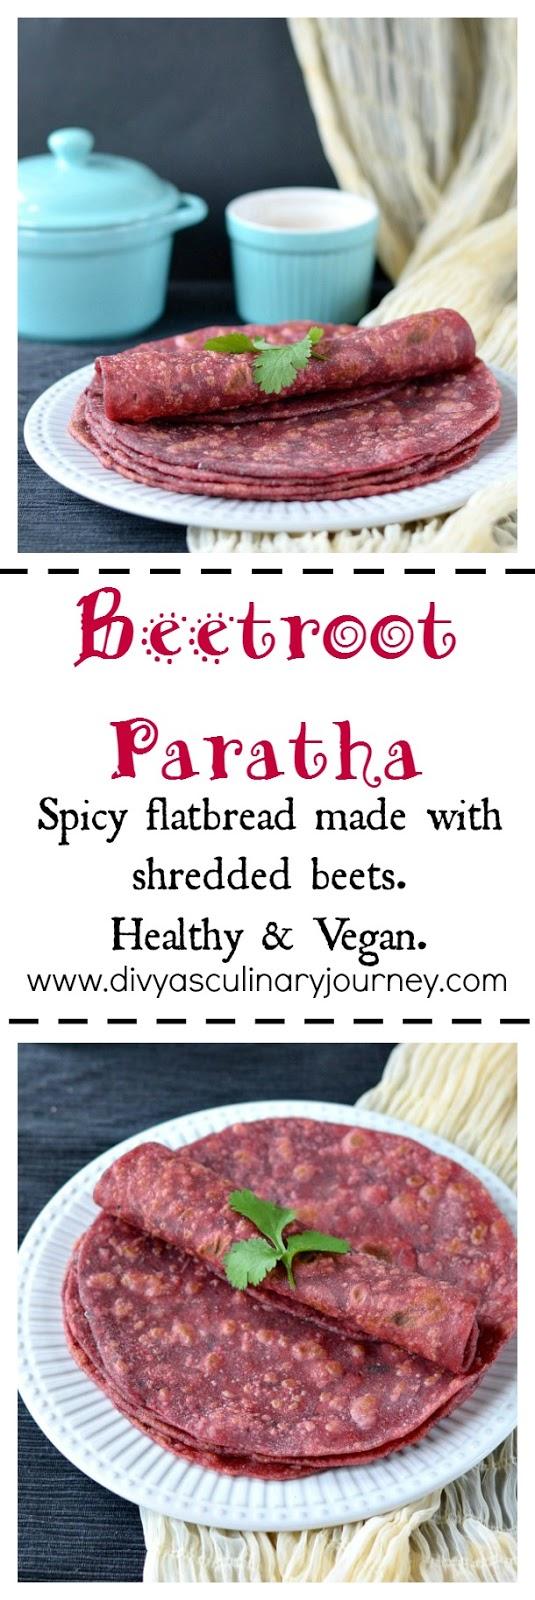 beetroot paratha, healthy recipes using beets, kid friendly recipes